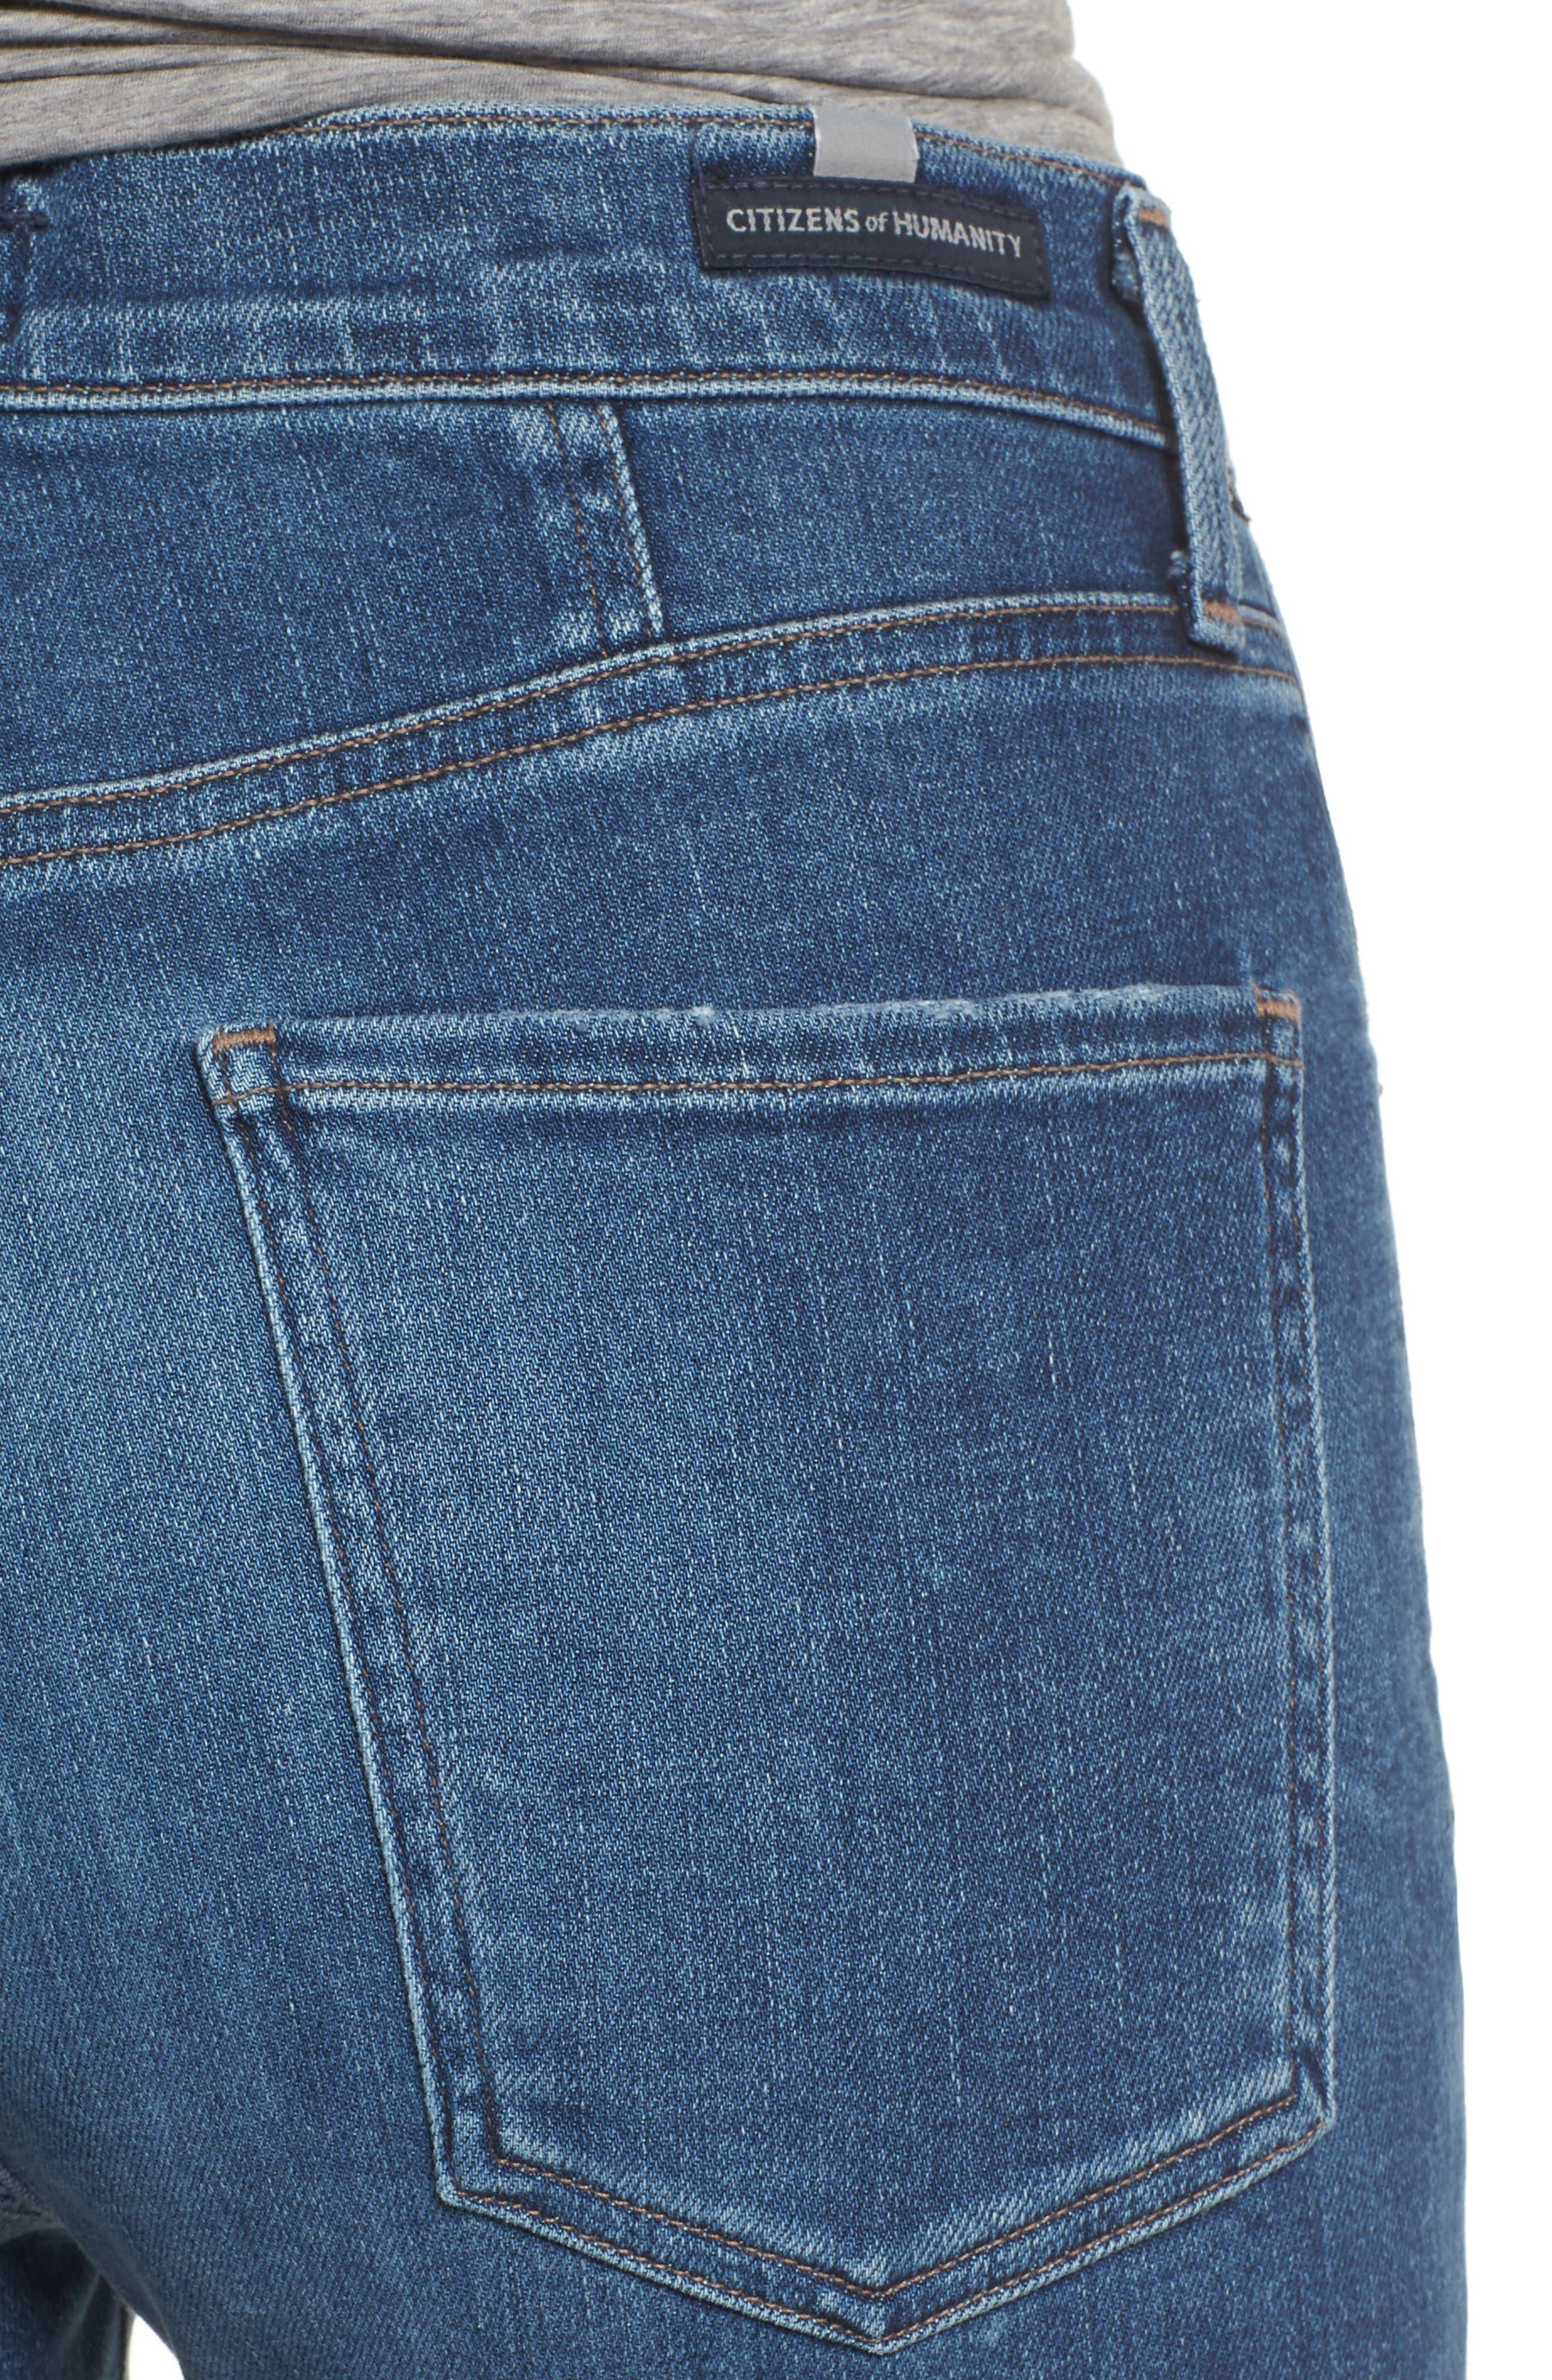 Chrissy High Waist Skinny Jeans,                             Alternate thumbnail 4, color,                             455